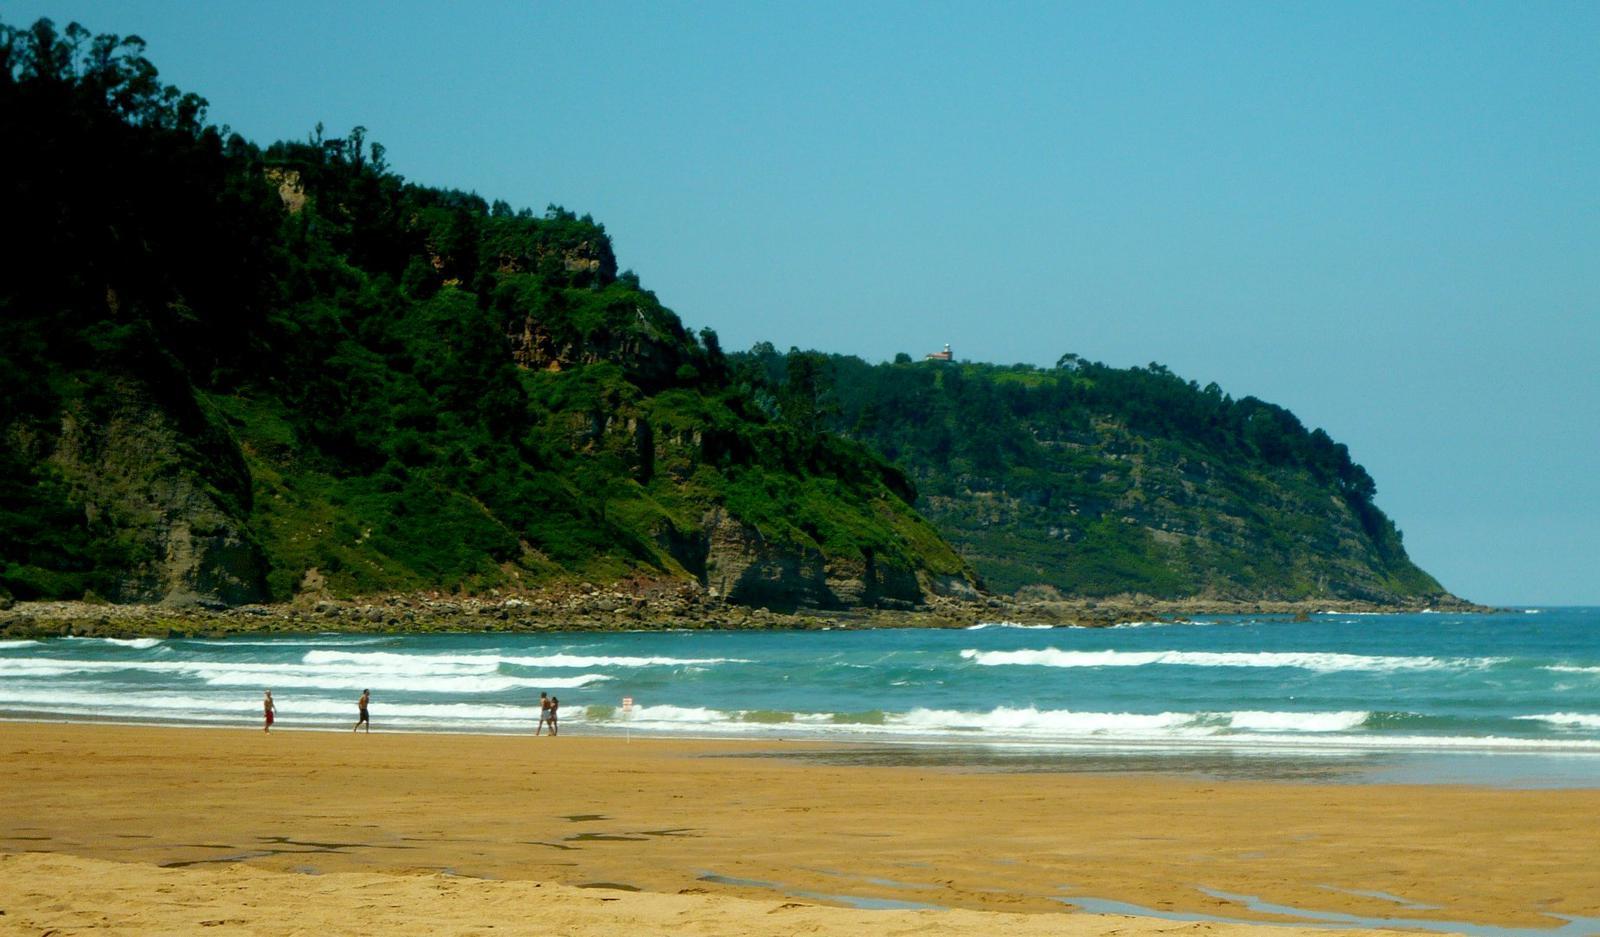 playas norte de españa Playa de Rodiles, Asturias